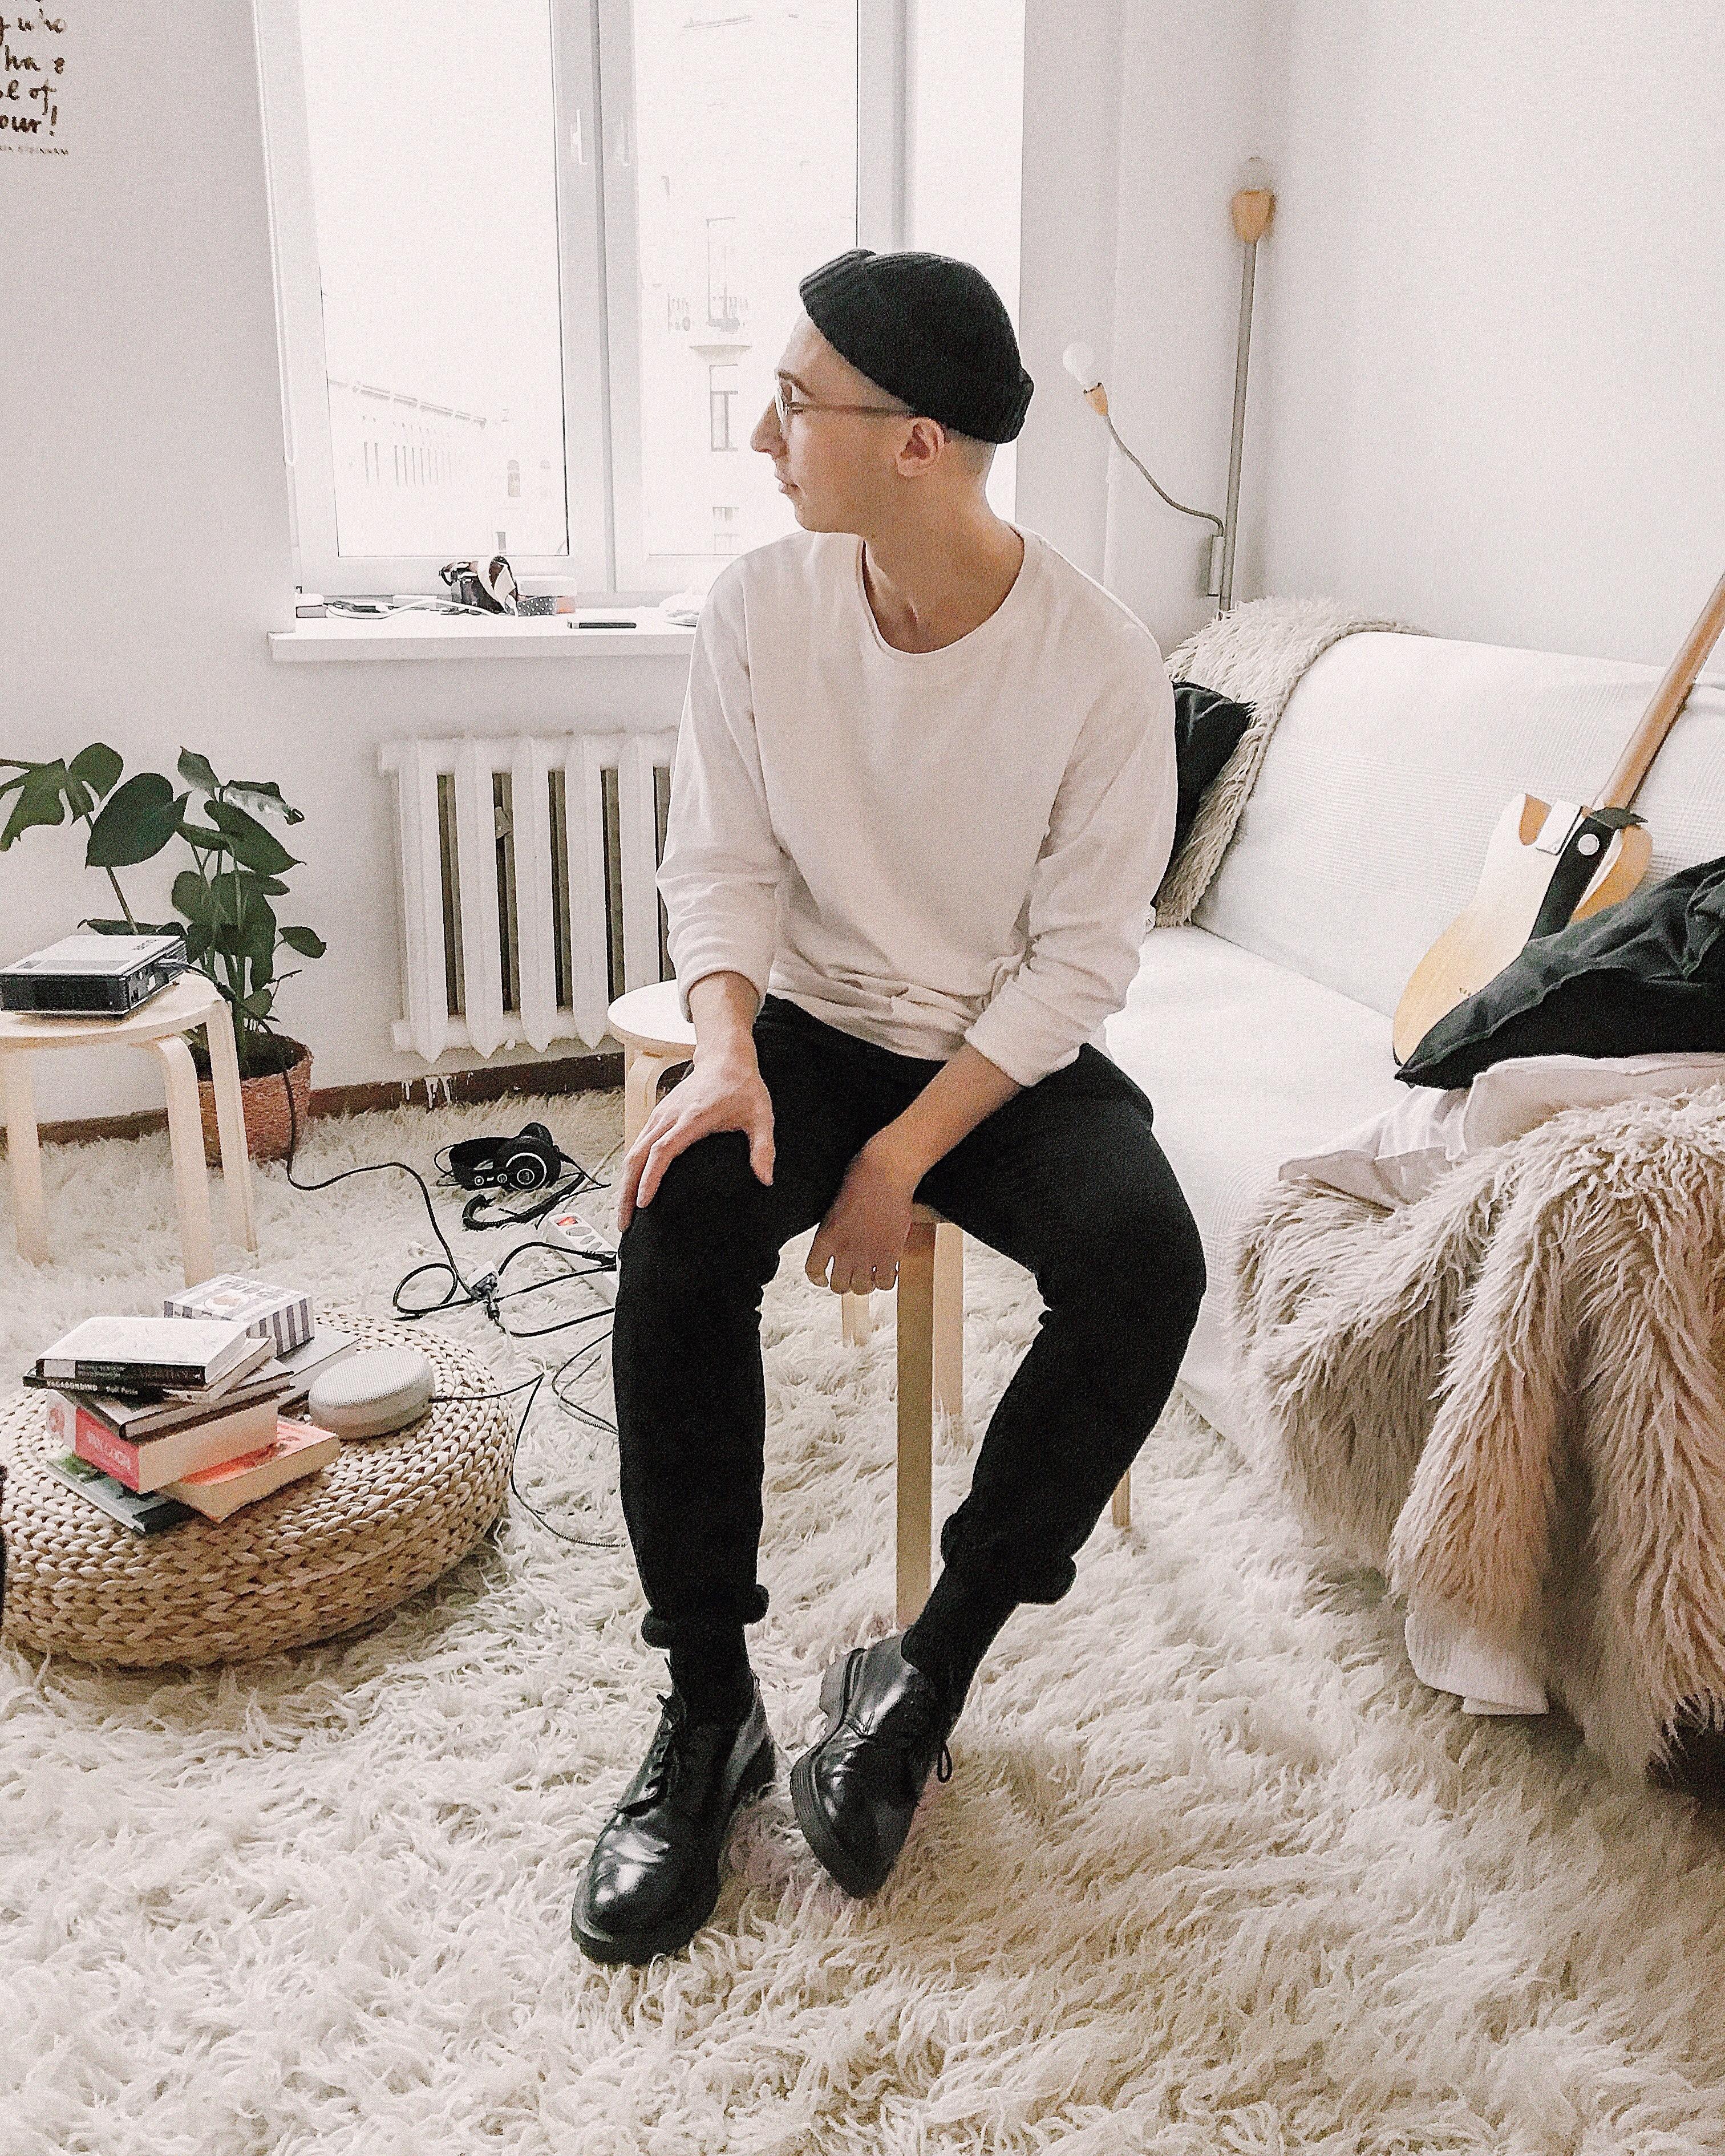 Man Wearing White Sweater With Black Pants, Bonnet, Chair, Eyewear, Furnitures, HQ Photo